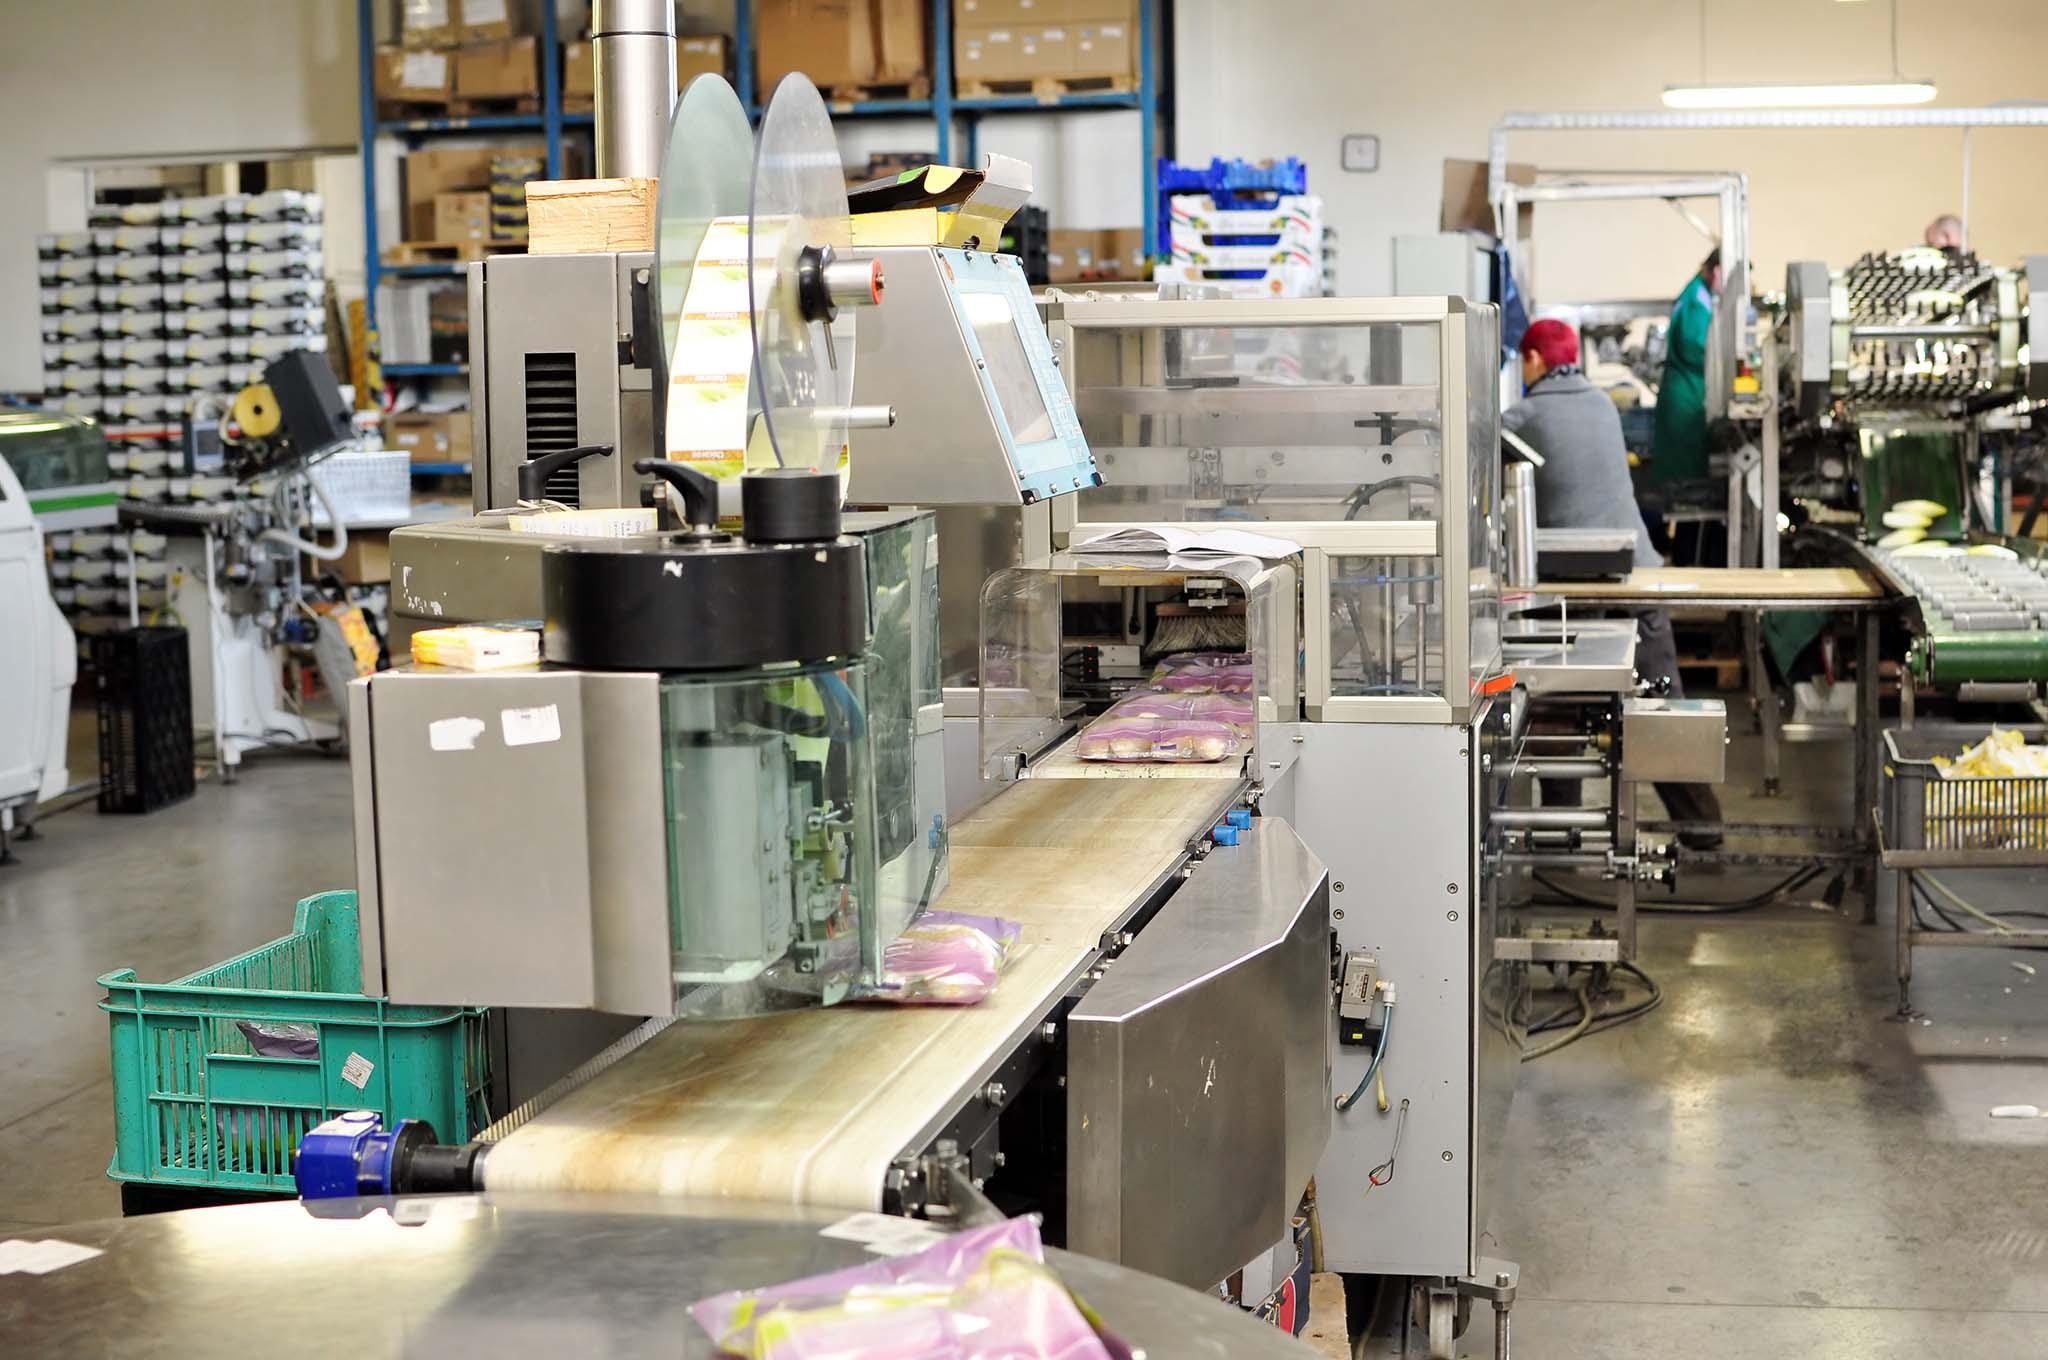 Verpackungsmaschine Lebensmittel Hygiene